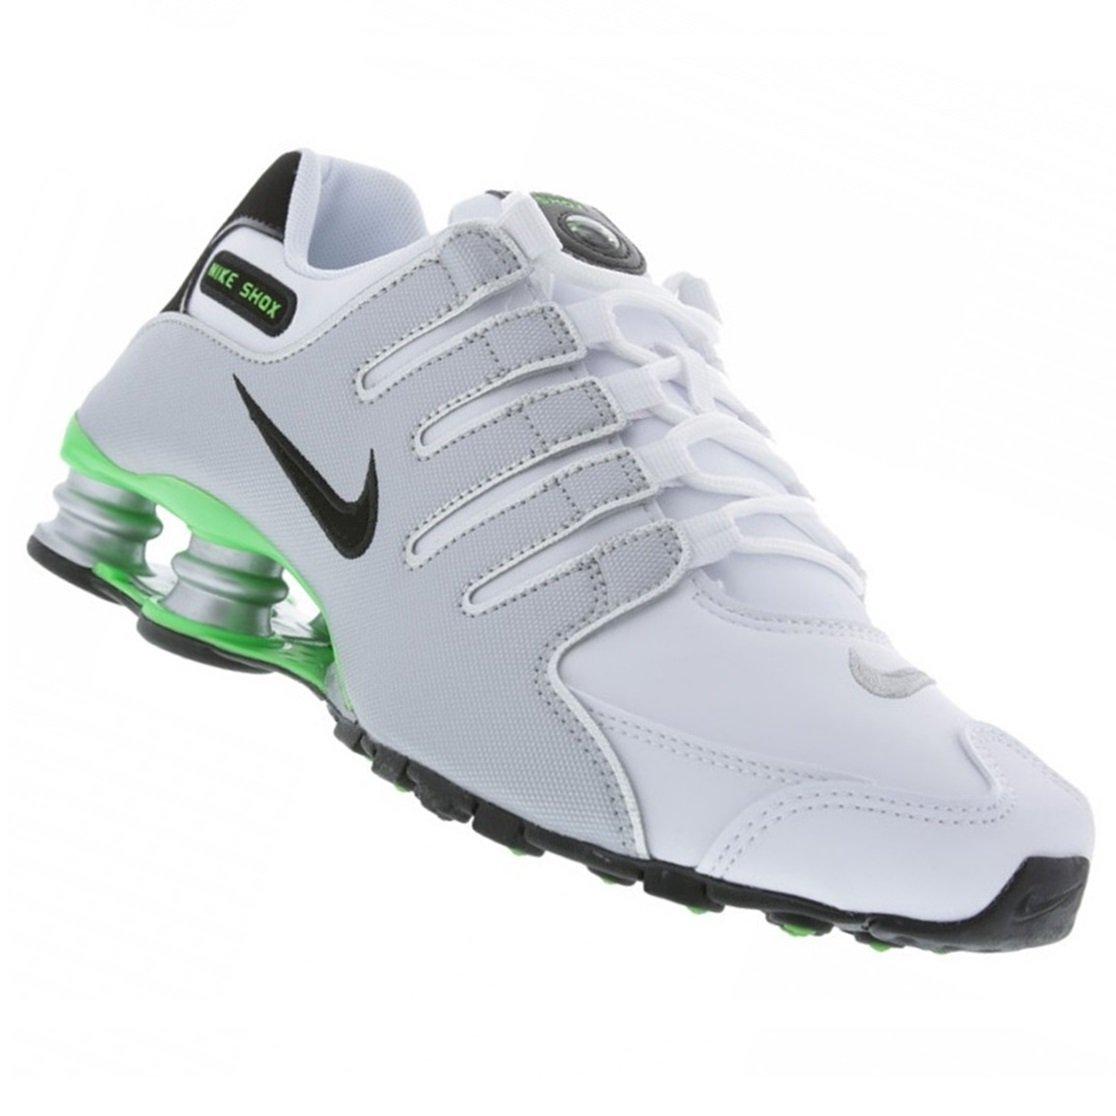 Tênis Masculino Nike Shox NZ 378341-113 - Branco Prata Verde ... 7abd7e3784a3c